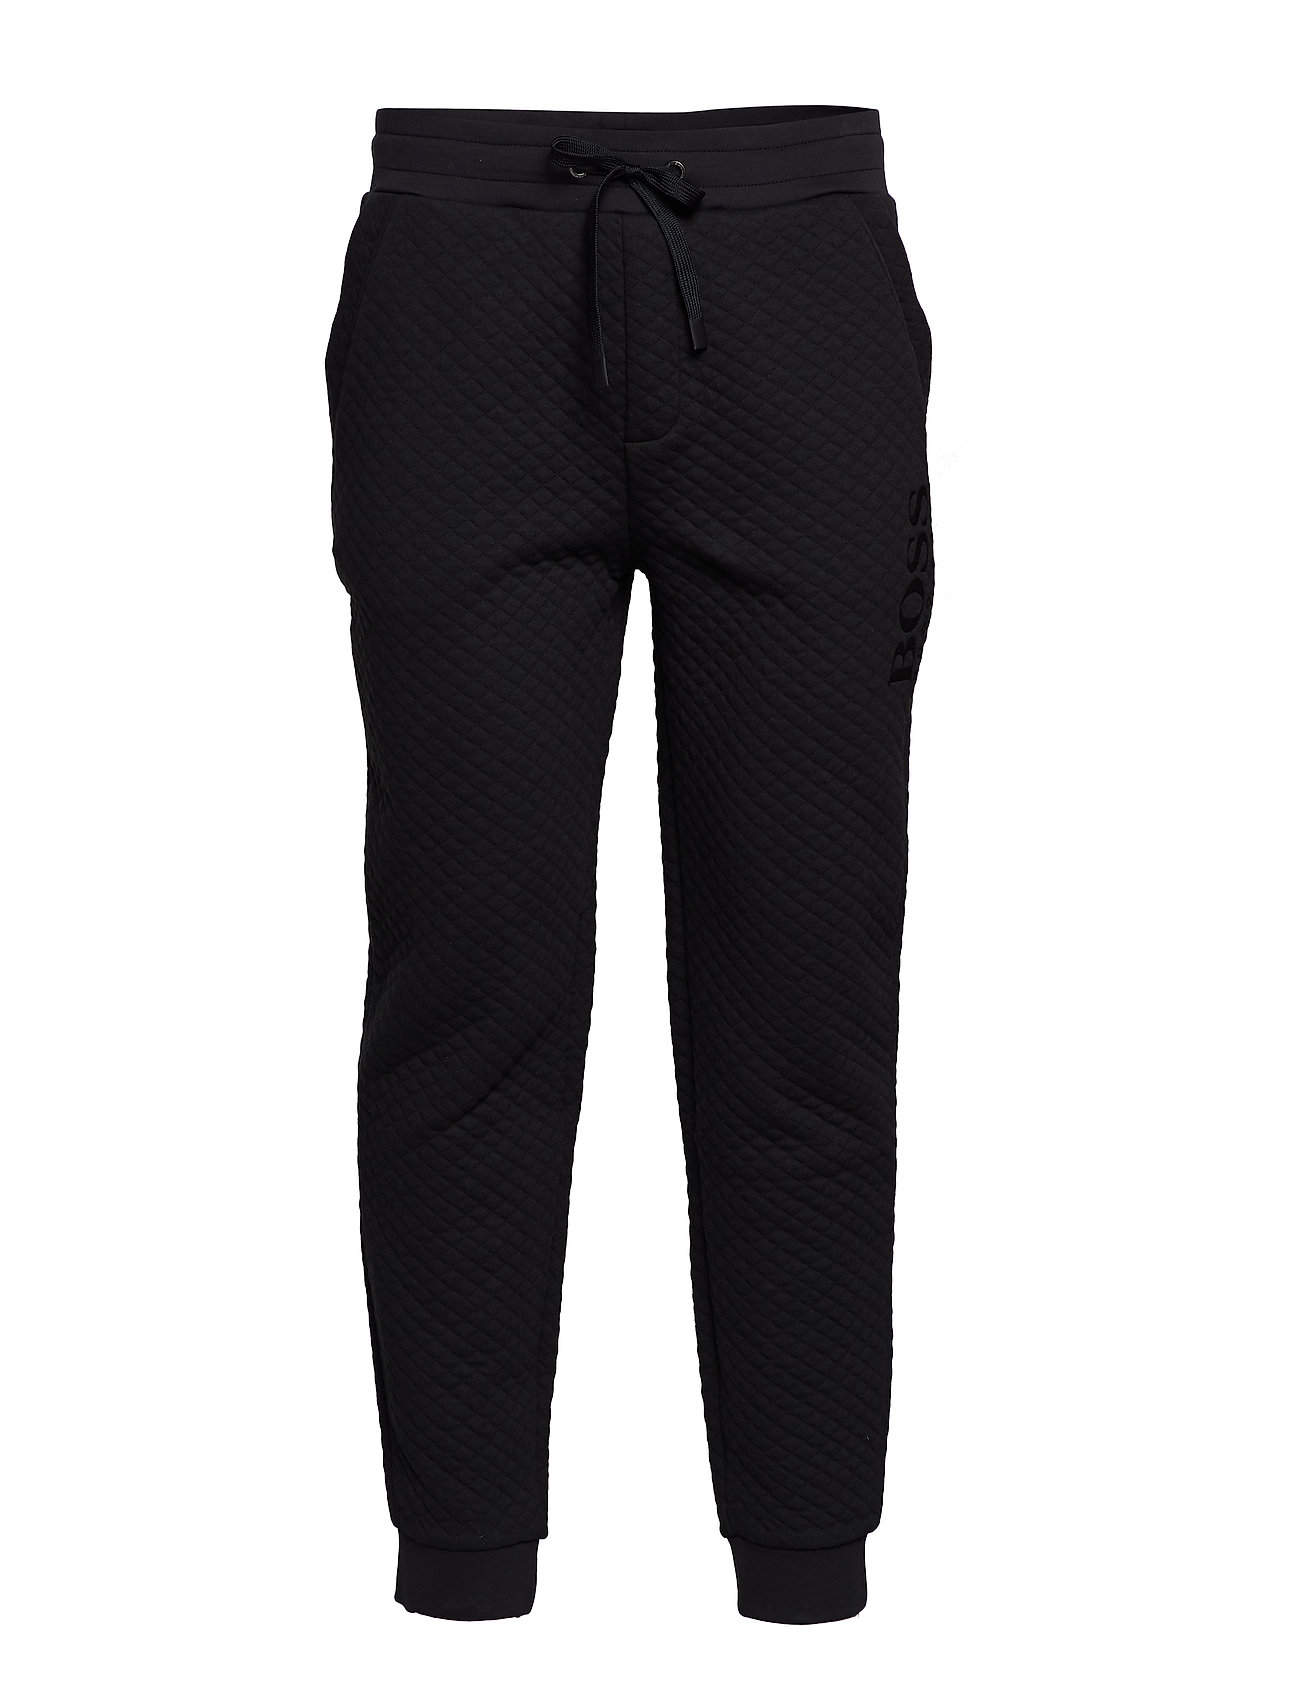 BOSS Business Contemp Pants - BLACK